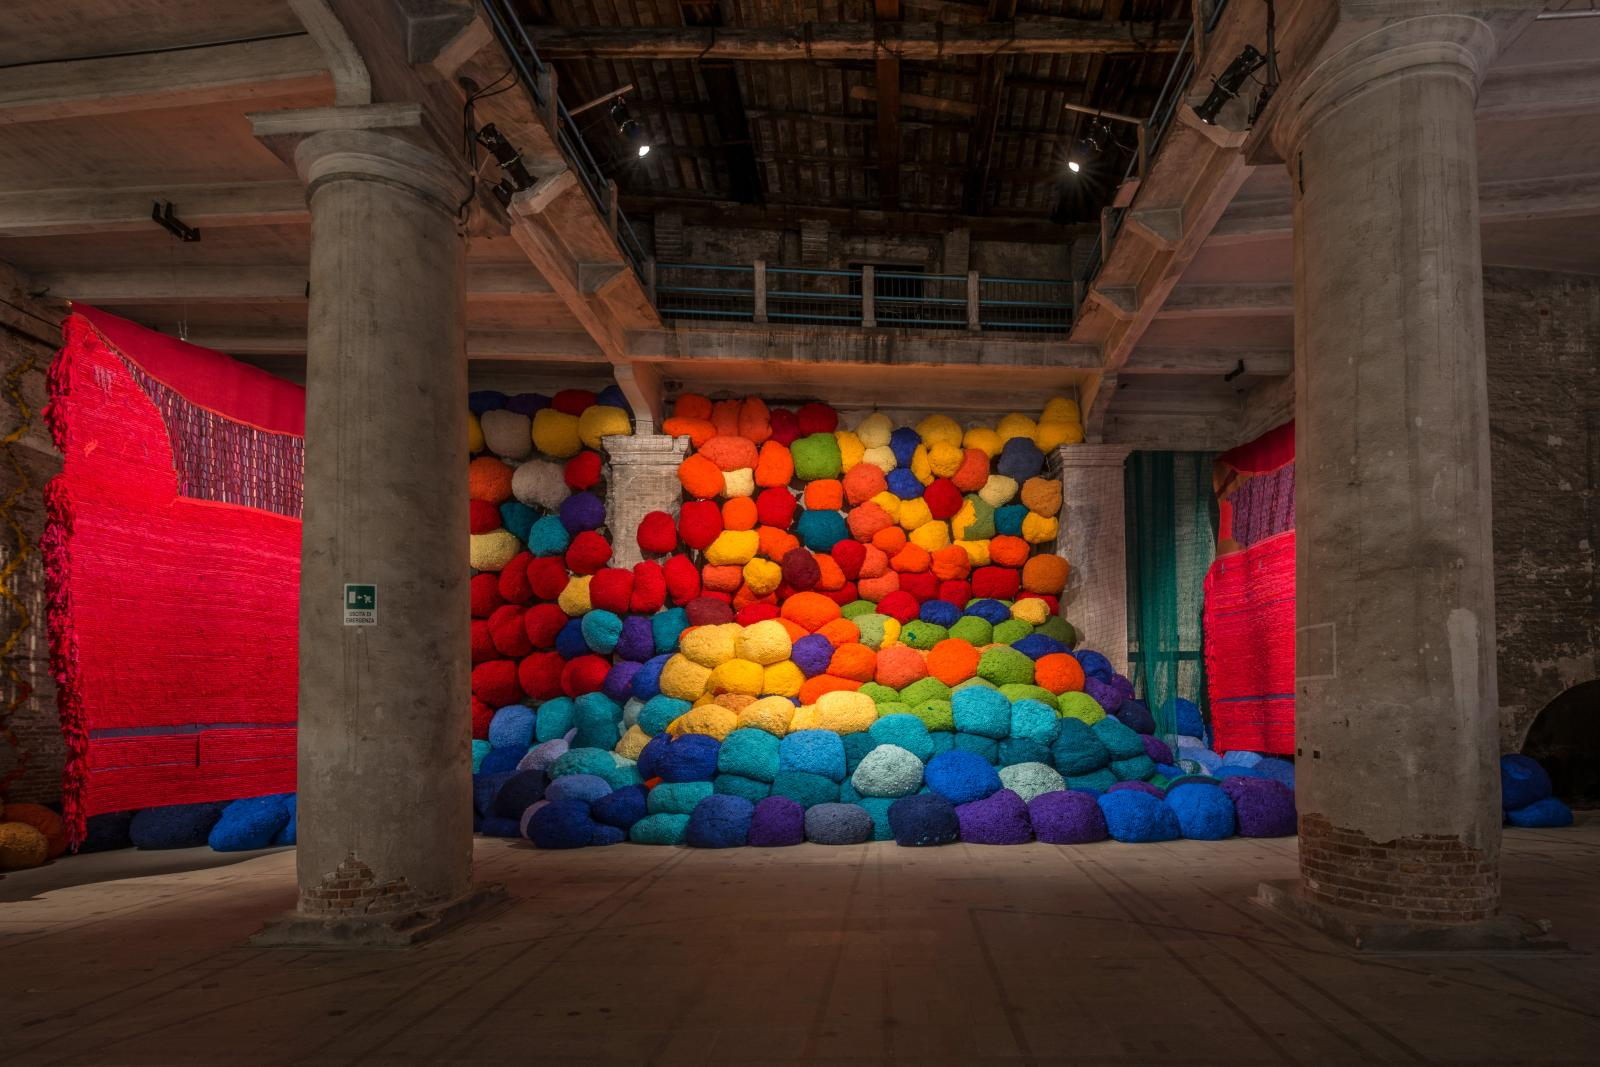 Sheila Hicks (née en 1934), Scalata al di la dei terreni cromatici/Escalade Beyond Chromatic Lands, 2016-2017, installation, technique mixte, 6x16x